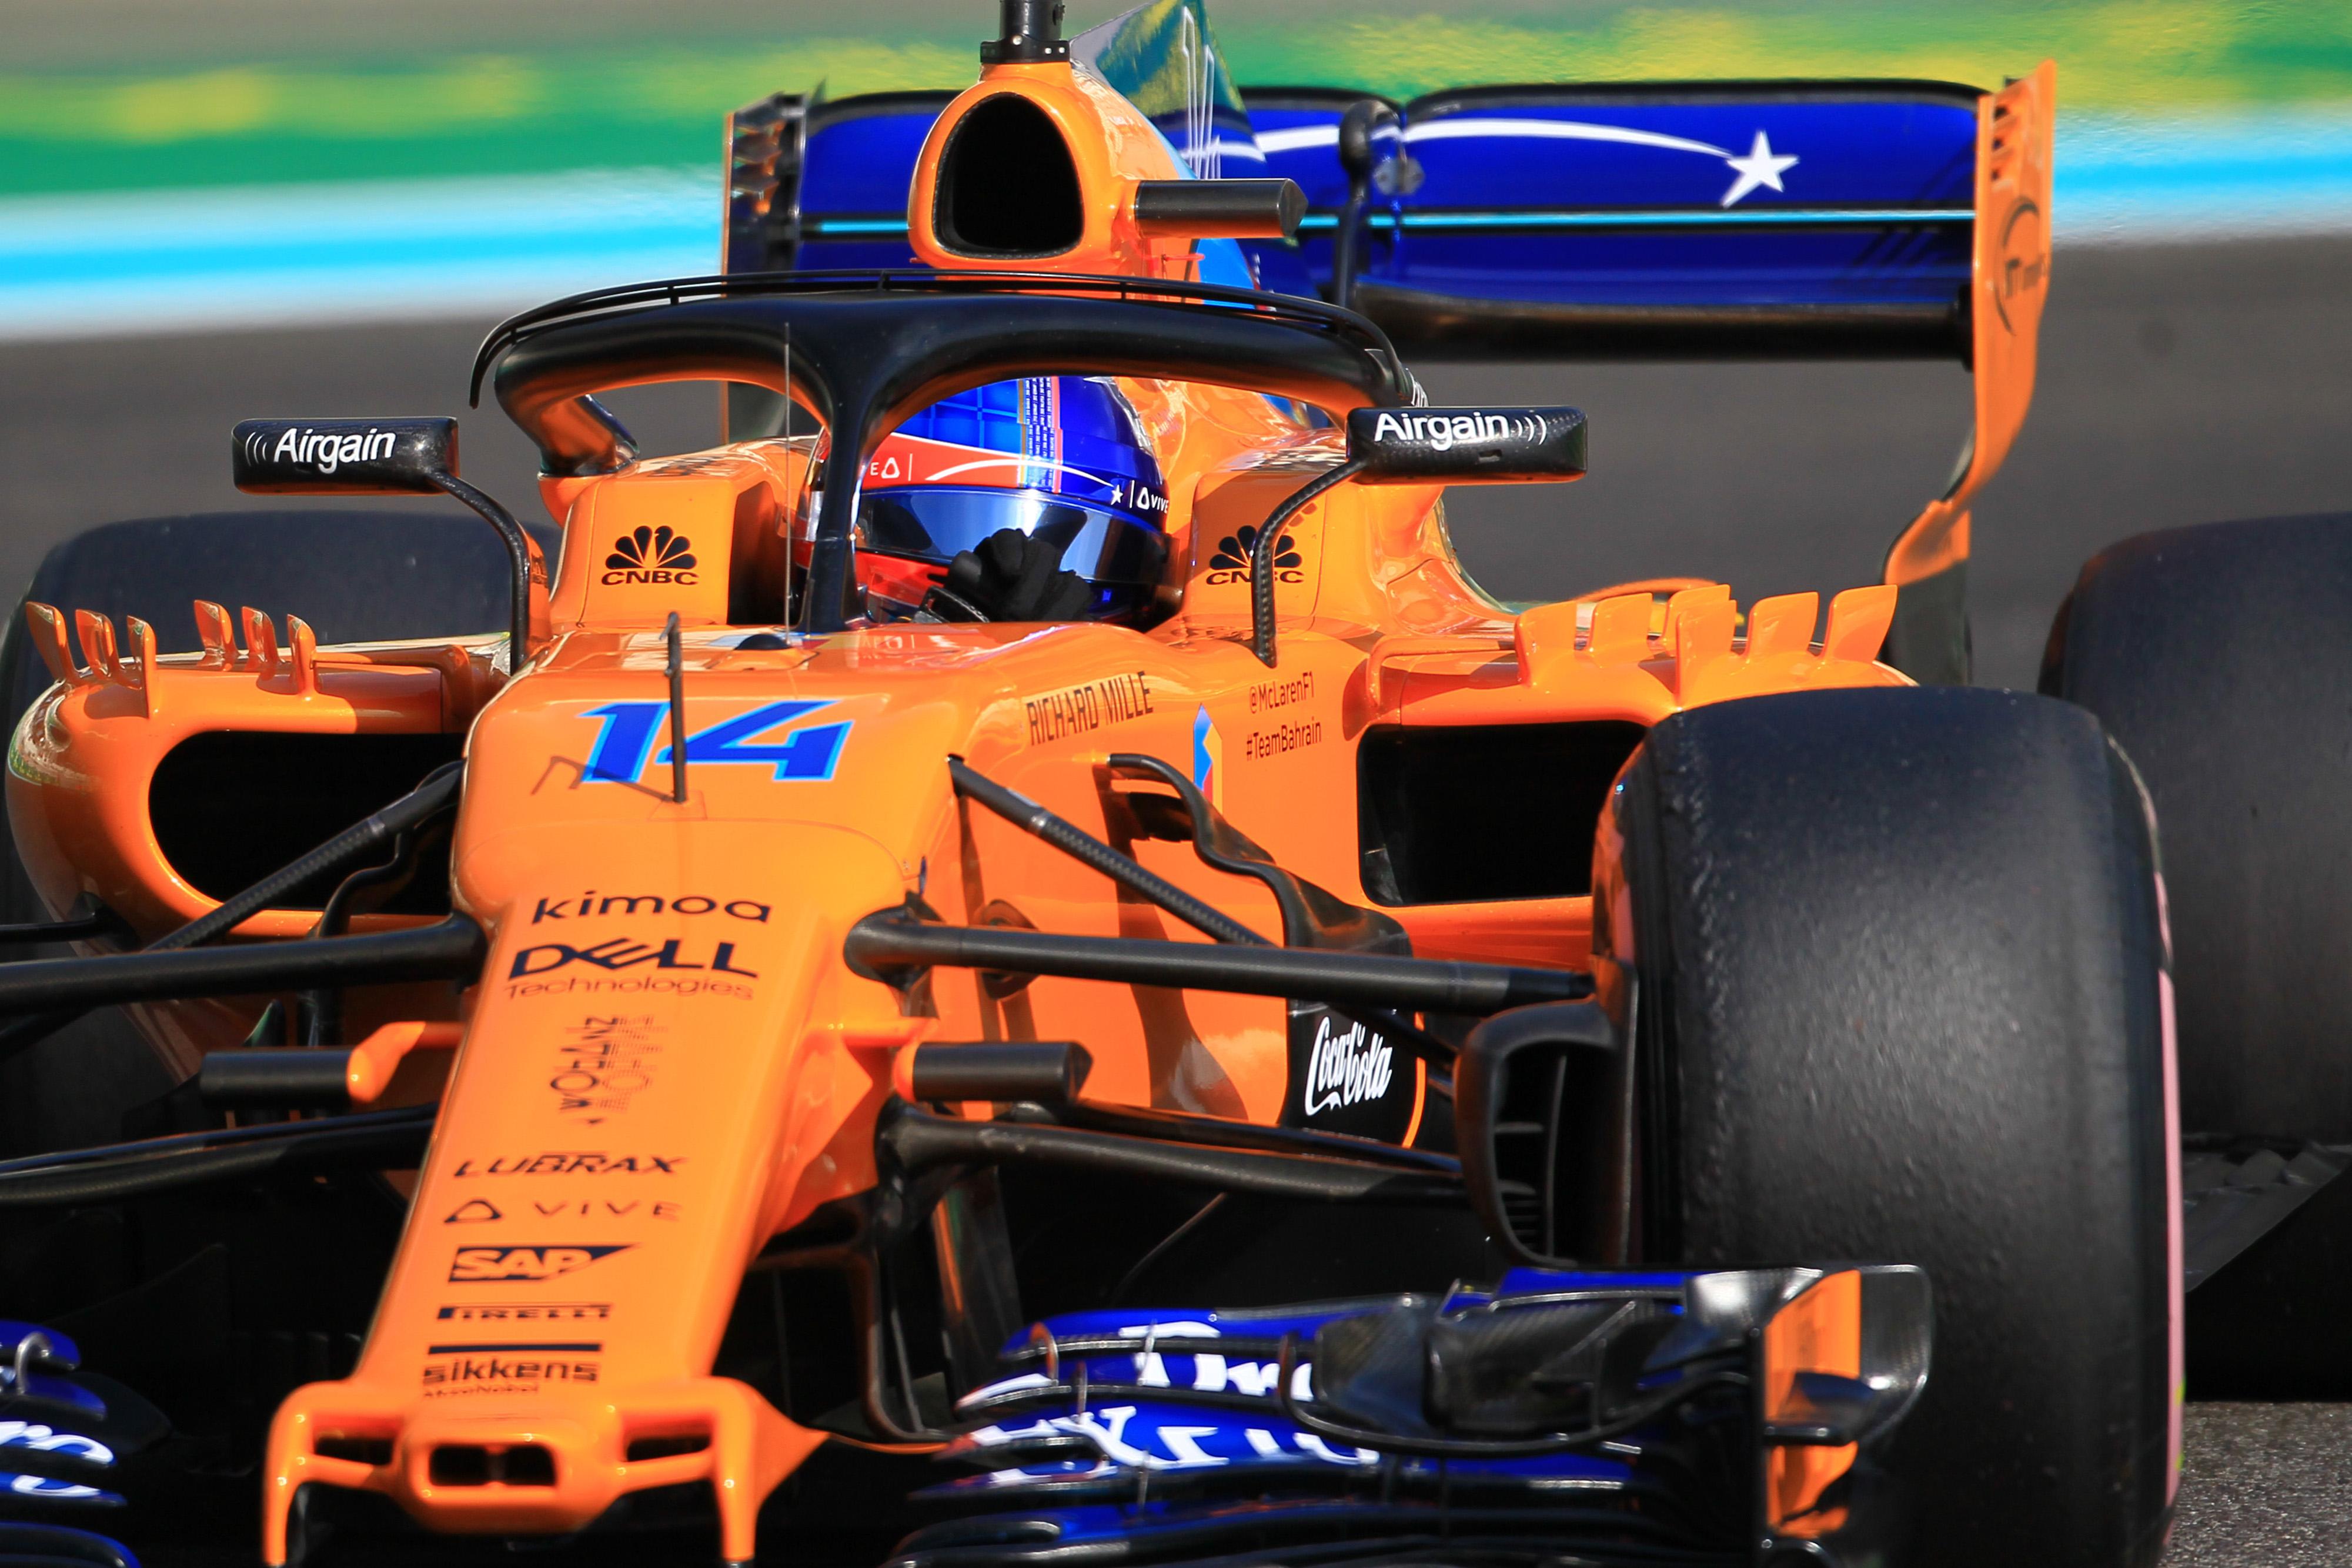 F1 Formula 1 Fernando Alonso McLaren Indy 500 Toyota Gazoo Racing